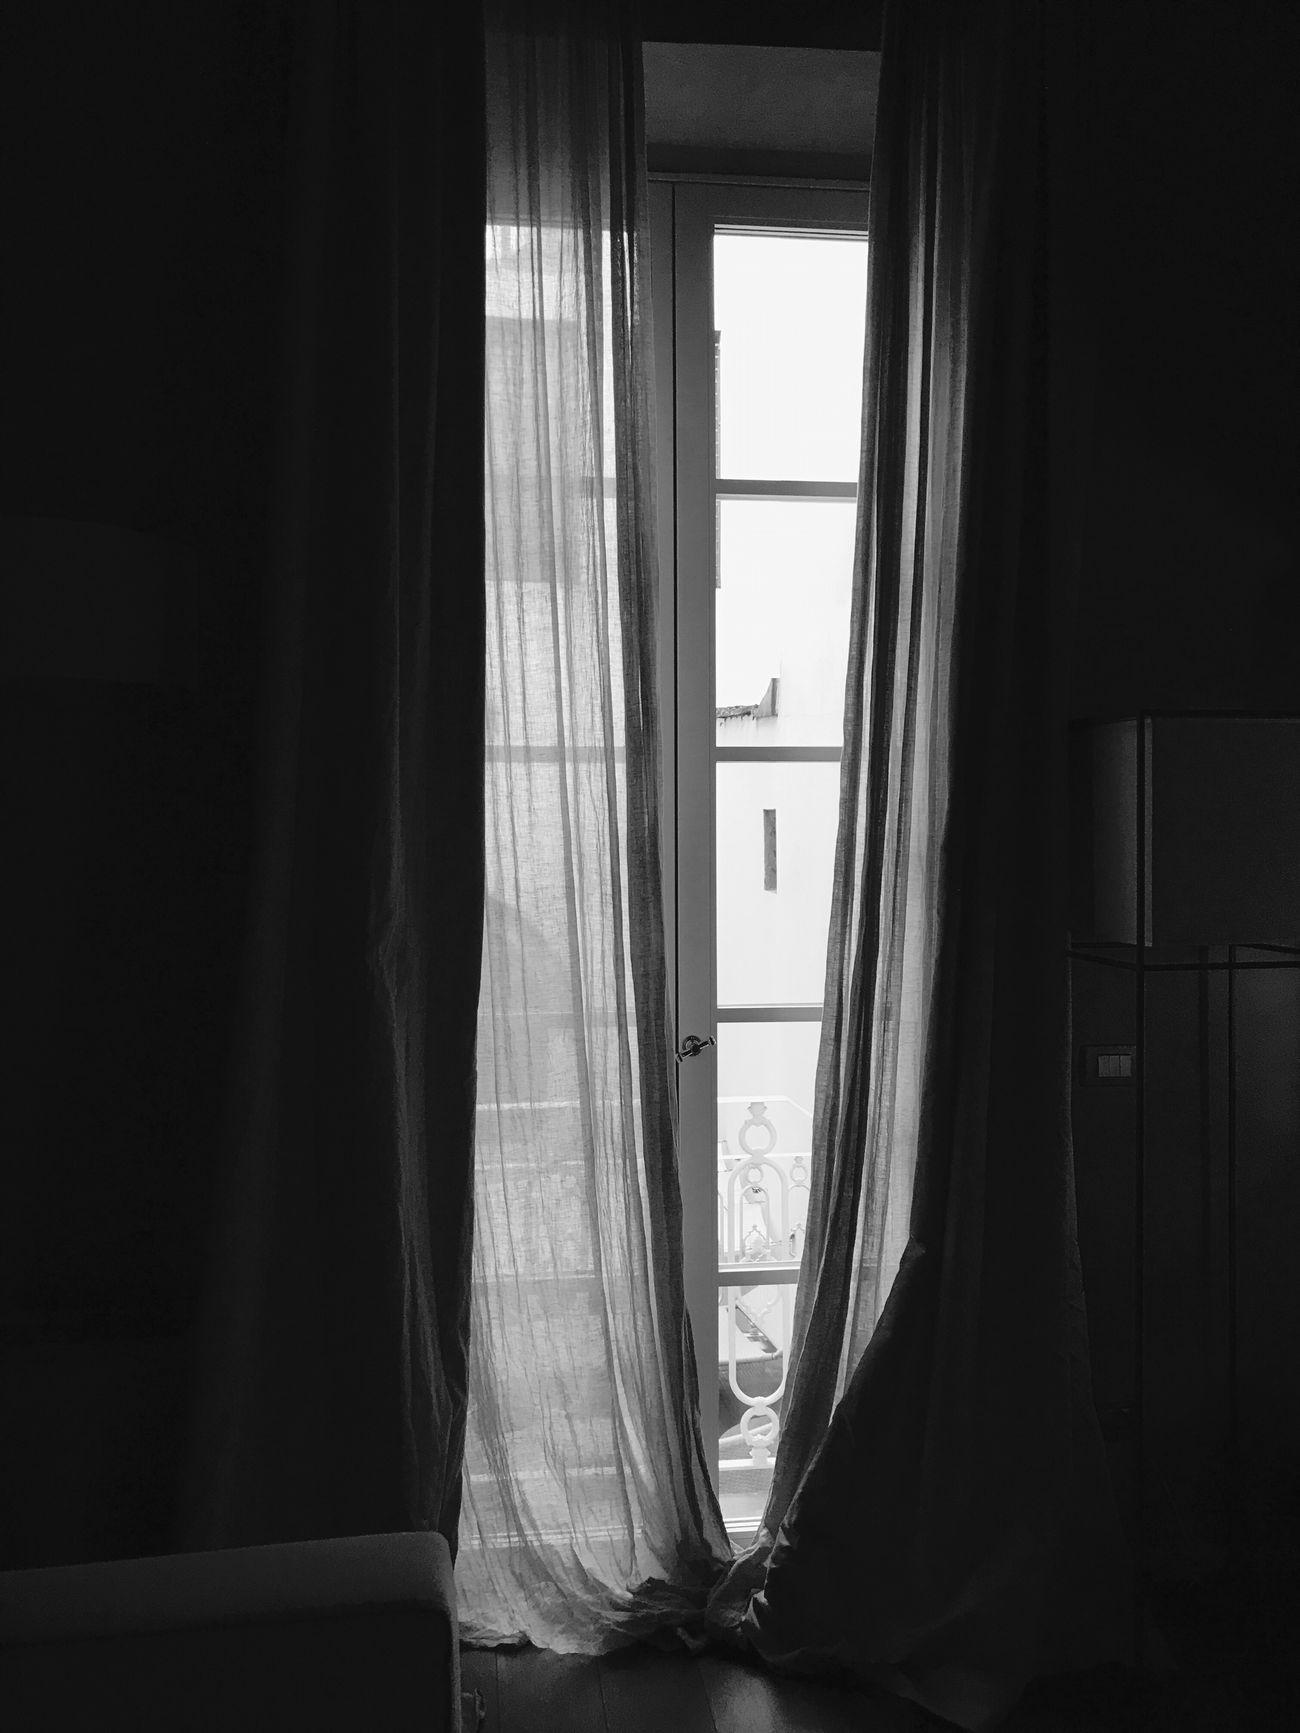 Lost Black & White Photooftheday Bnw_collection EyeEmBestPics EyeEm Bnw Great Atmosphere Eye4photography  Captured Moment Exklusive_shot EyeEm Gallery Life Events Photograph White Background EyeEm Best Shots Black And White Bnw_life Ligth And Shadow Eye4black&white  Eyem Best Shots Bnwphotography Photography Art Gallery Blancoynegro Home Interior Window